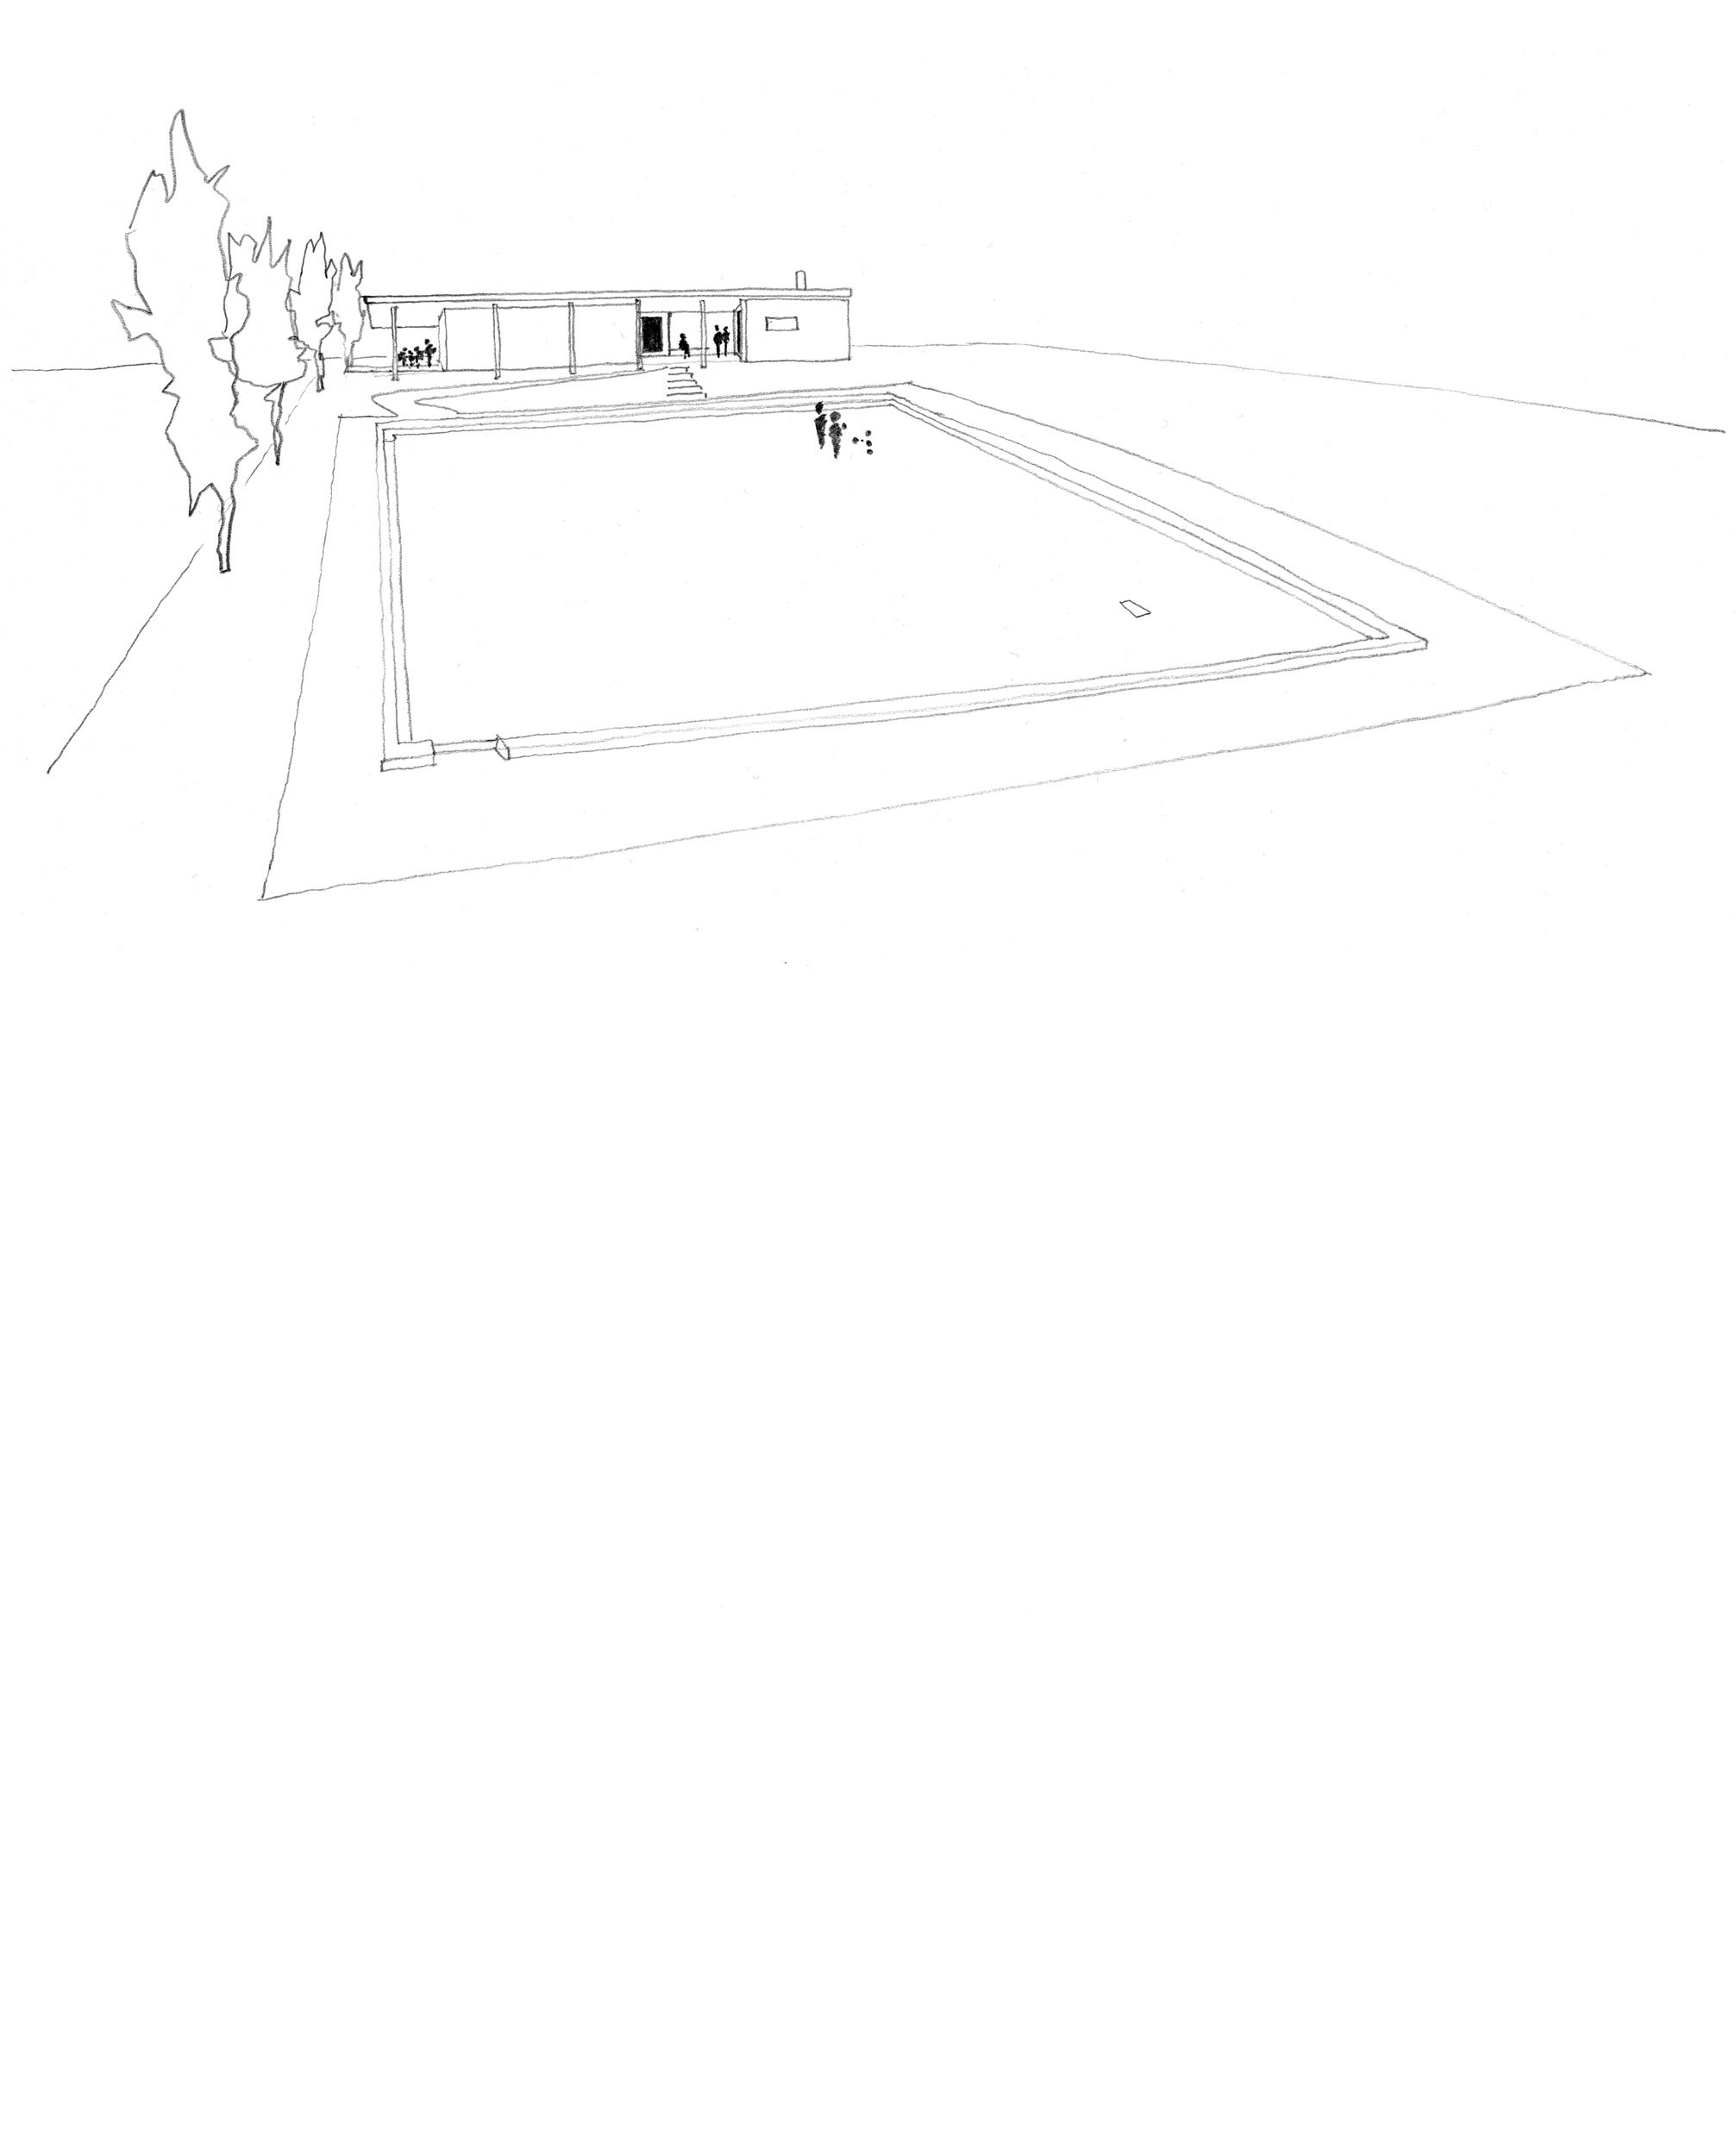 resized sketch portrait.jpg